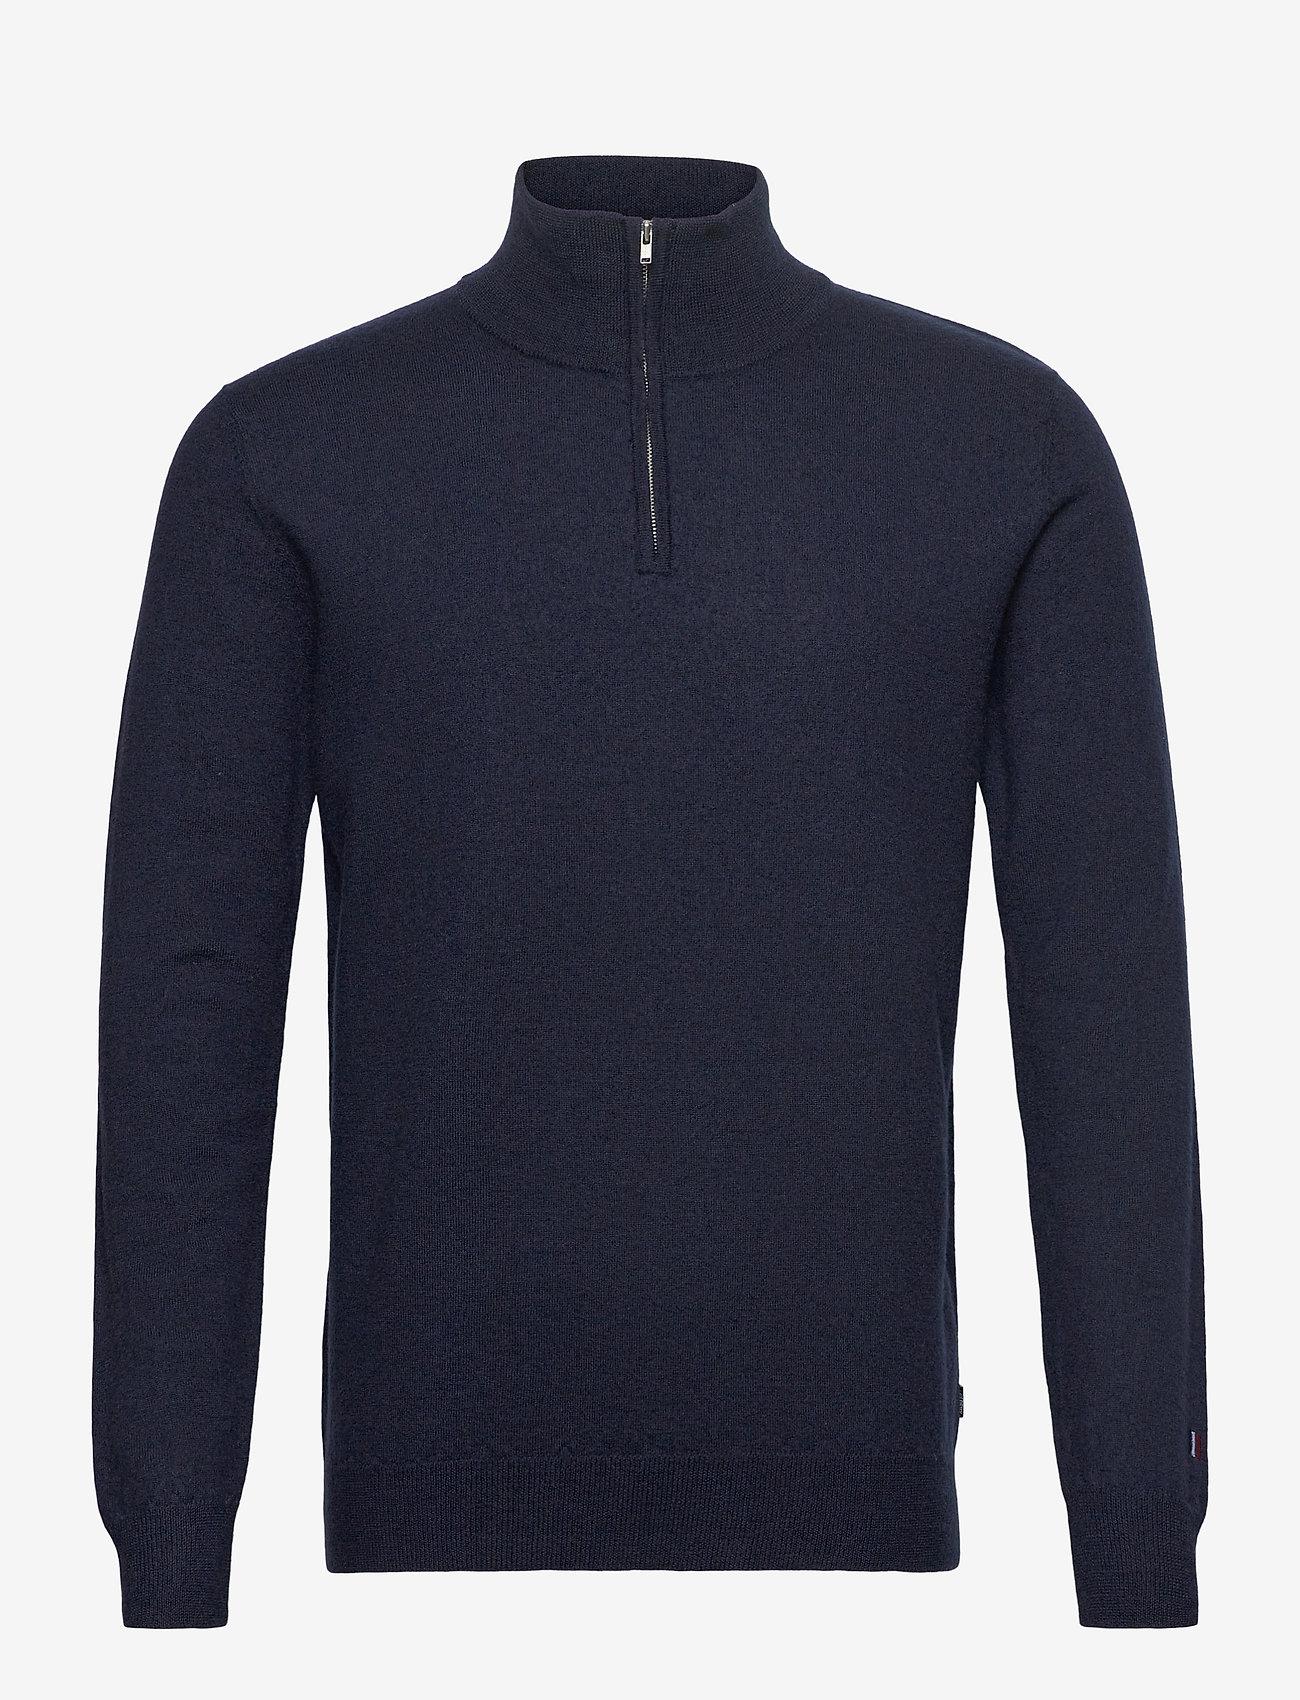 Les Deux - Edgar Half Zip Wool Knit - half zip - dark navy - 0